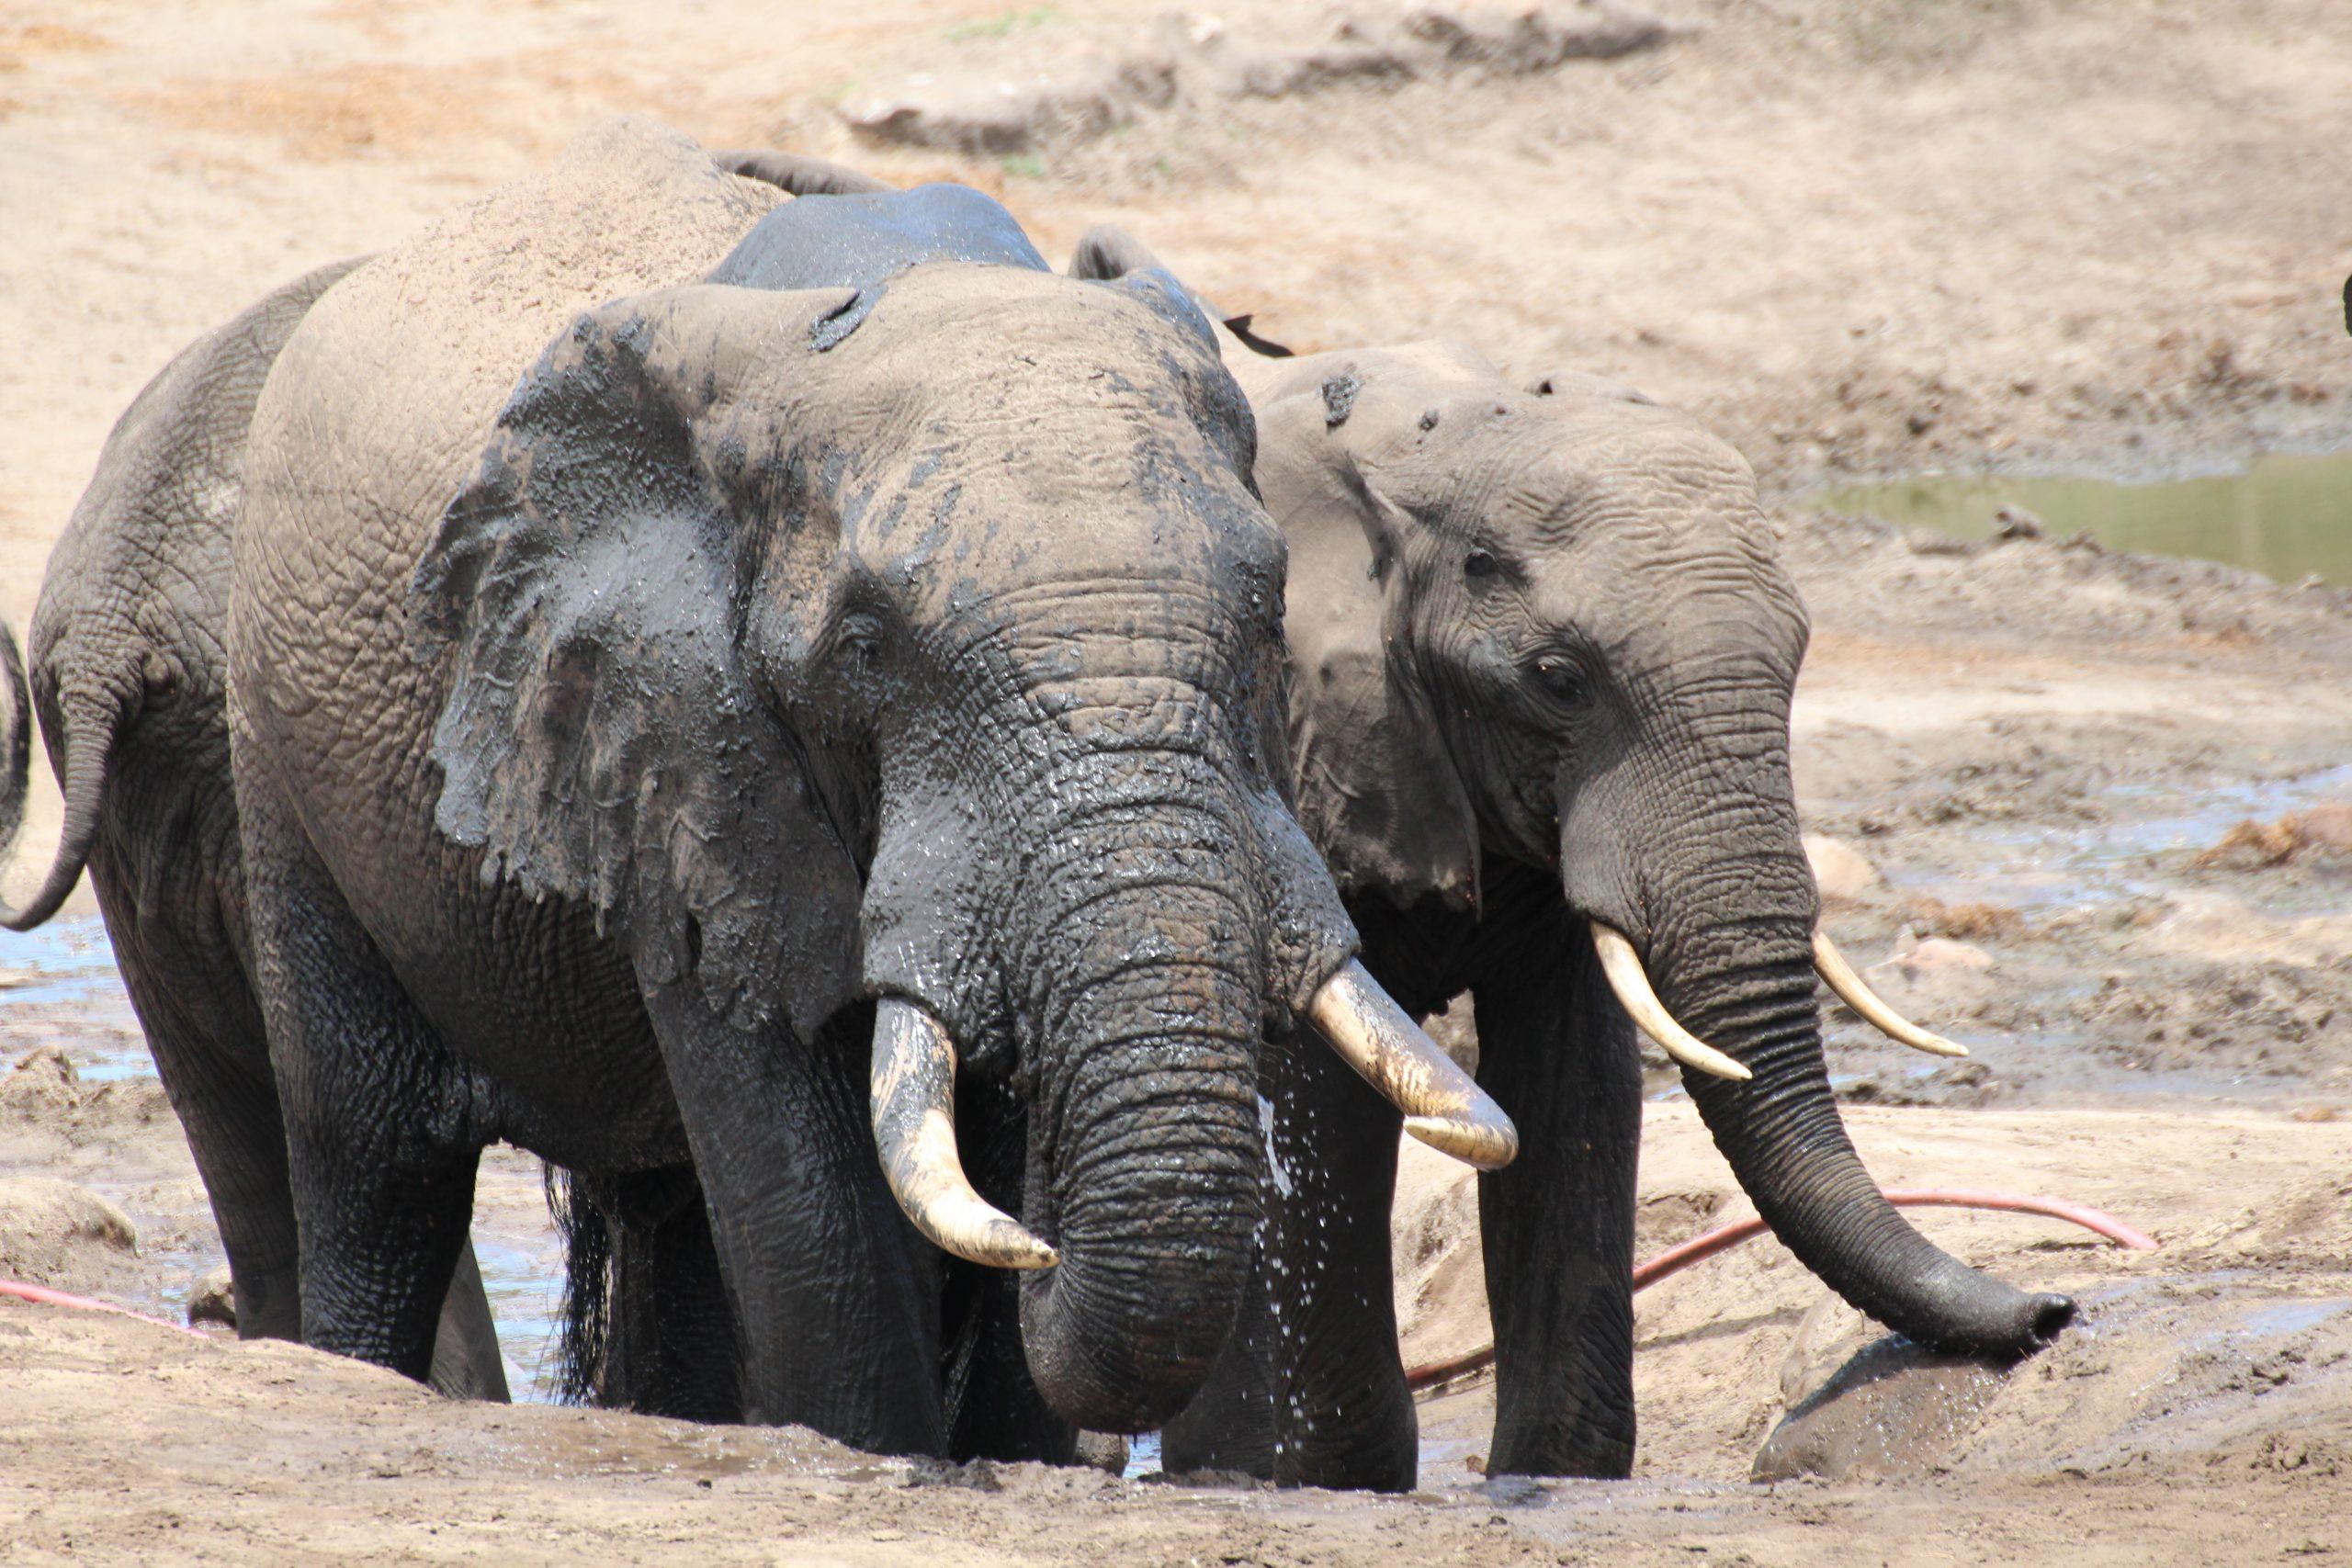 Safari with a baby - Elephants